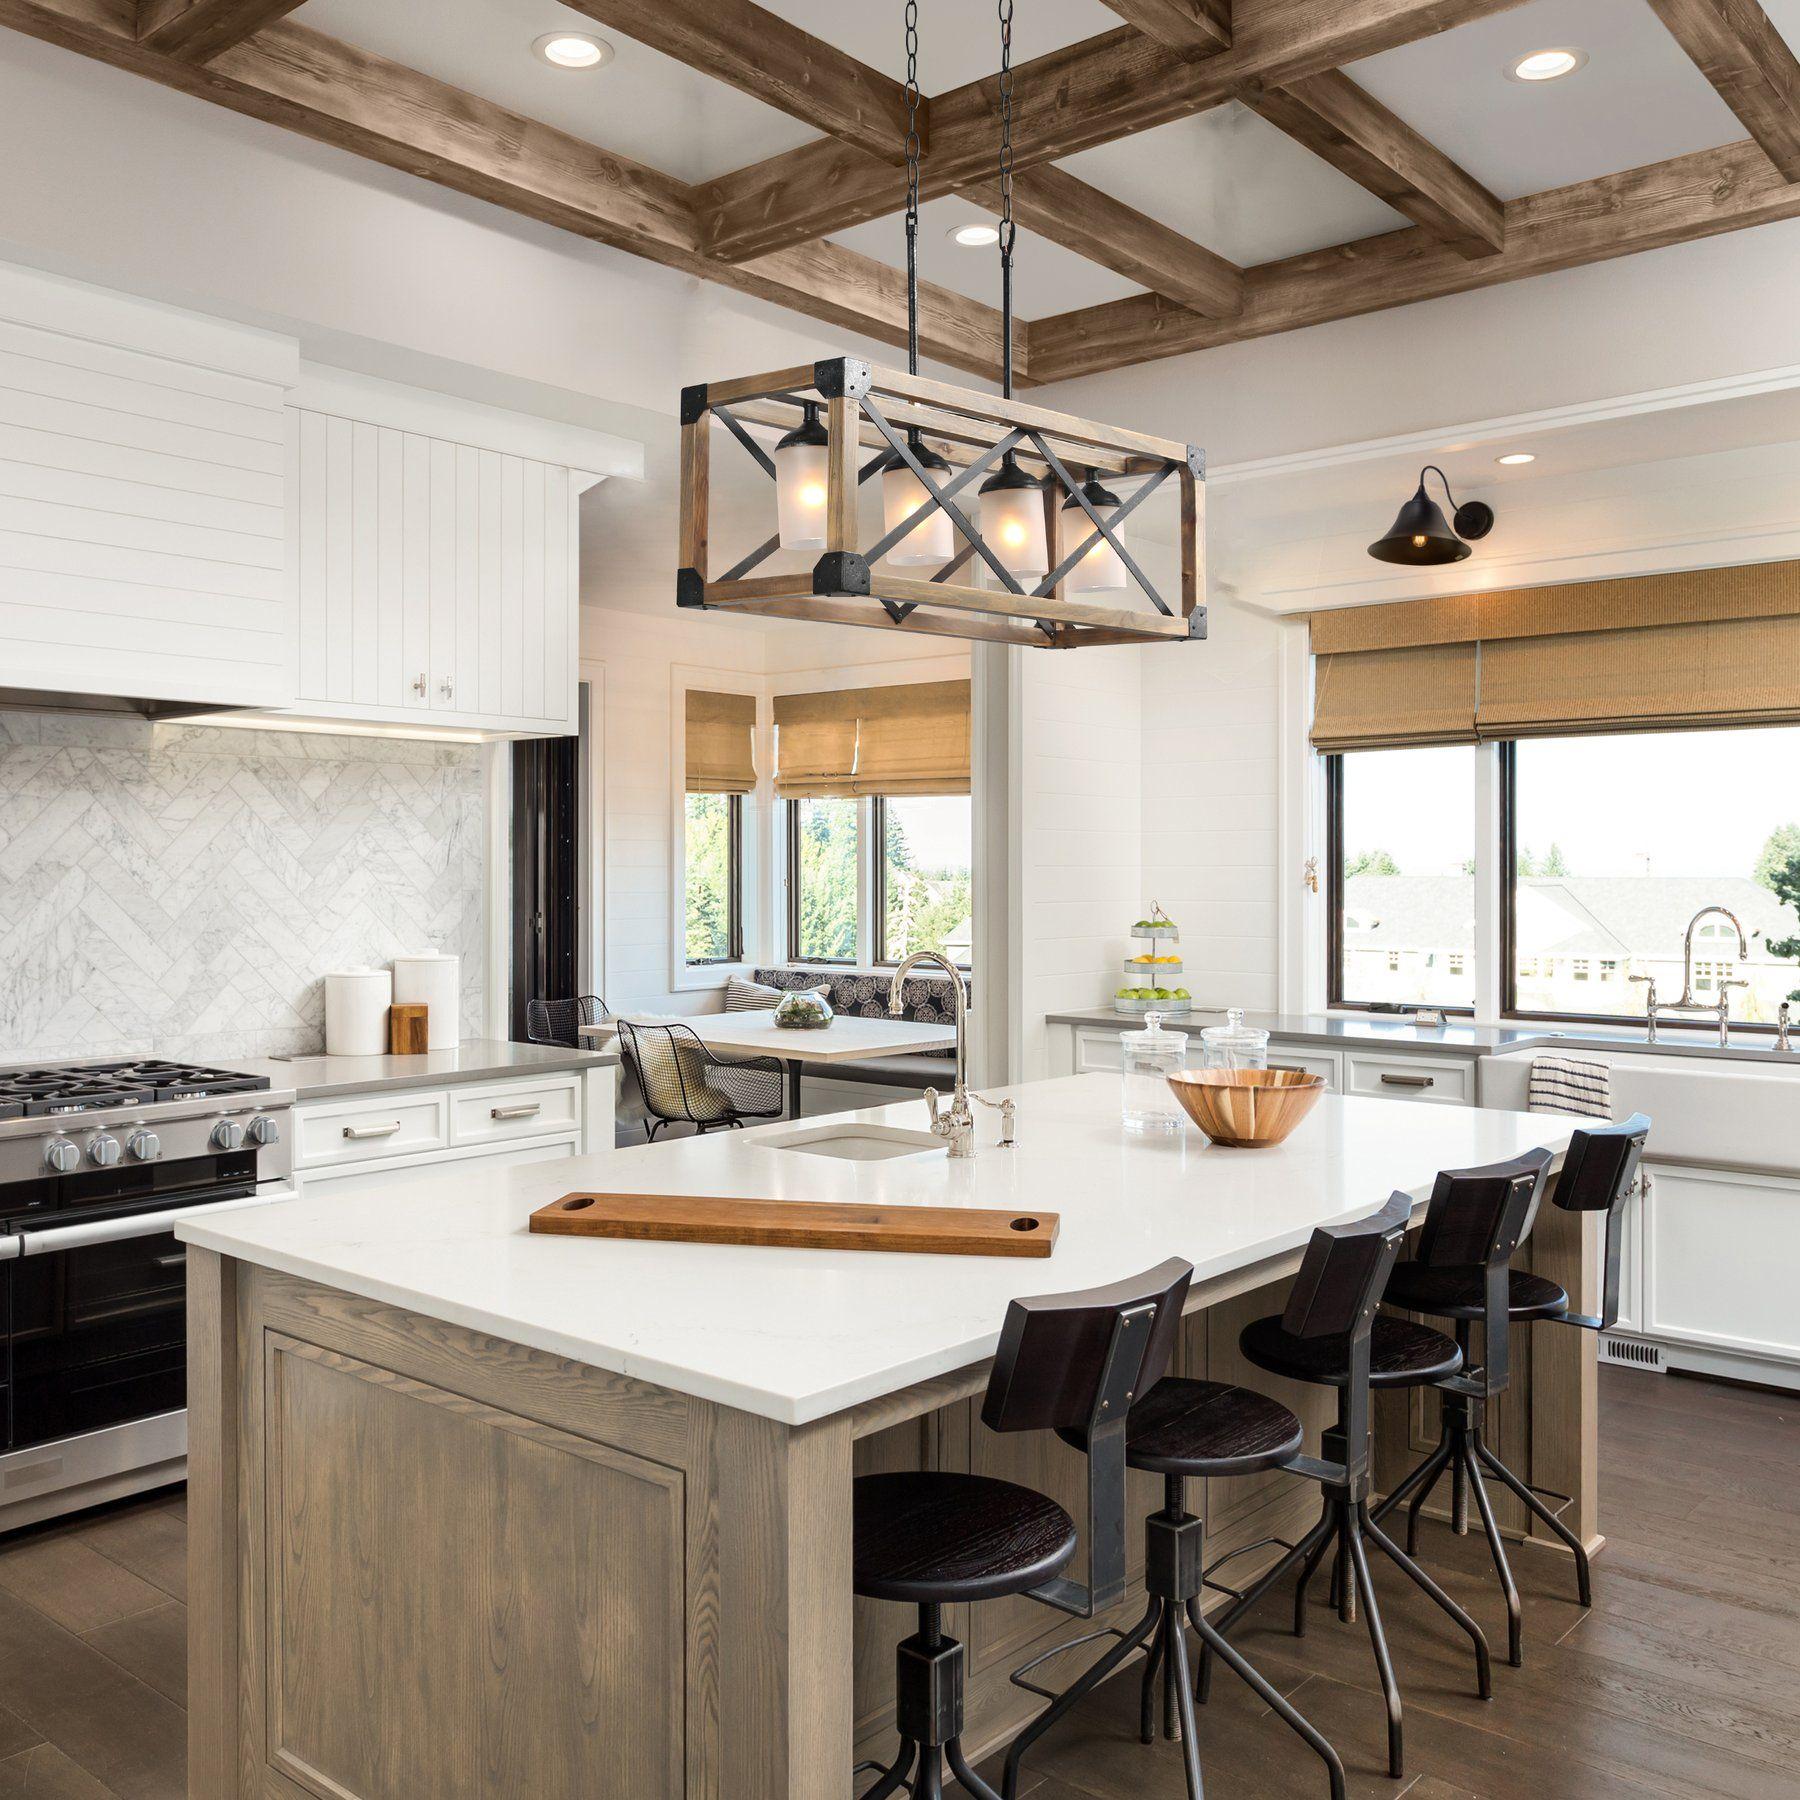 rectangle box pendant light 4 lights rustic kitchen island kitchen remodel kitchen design on kitchen id=17337